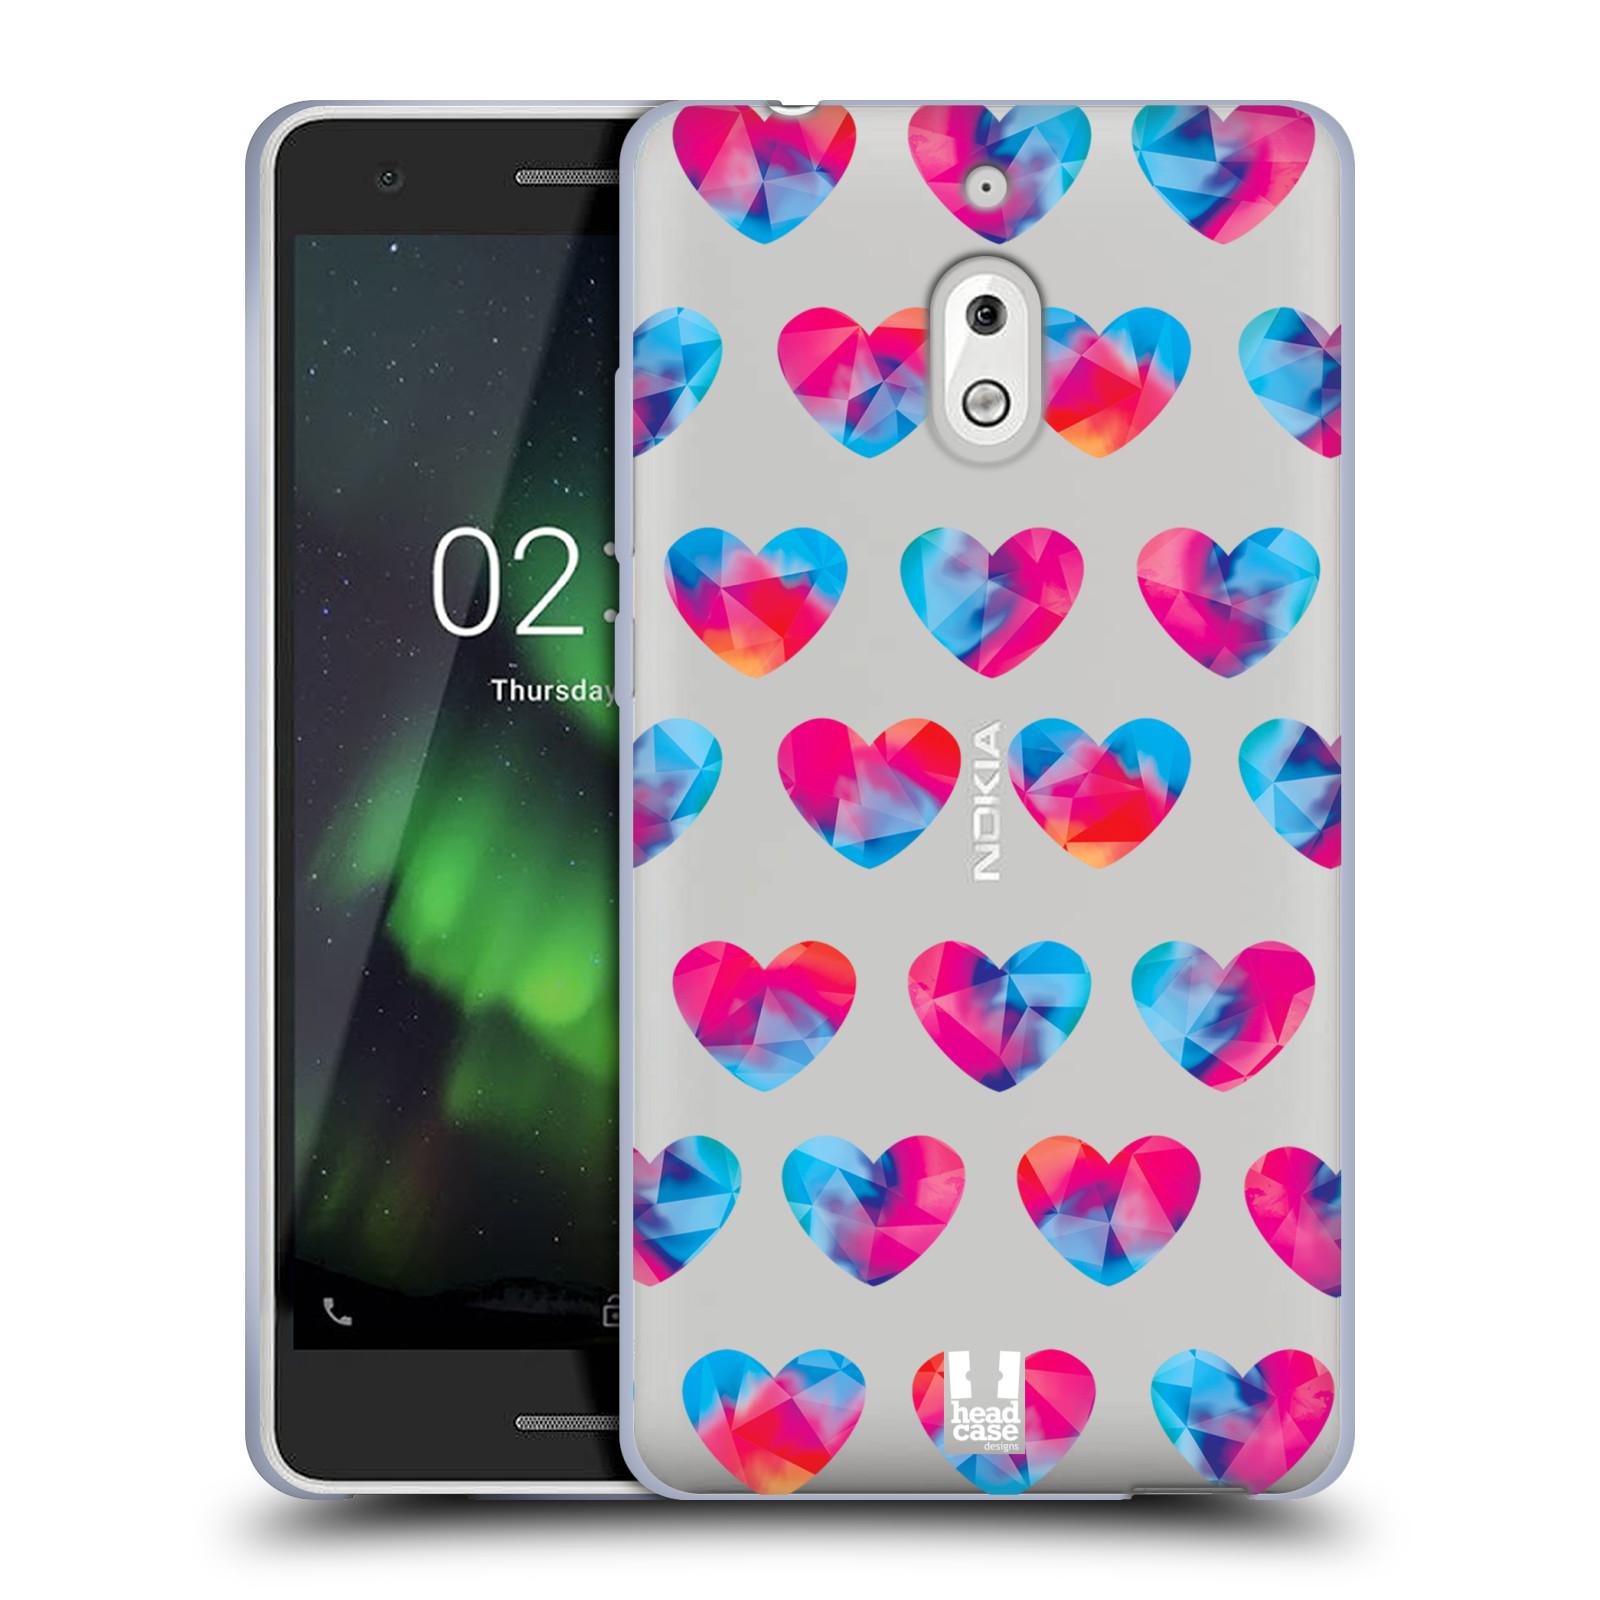 Silikonové pouzdro na mobil Nokia 2.1 - Head Case - Srdíčka hrající barvami